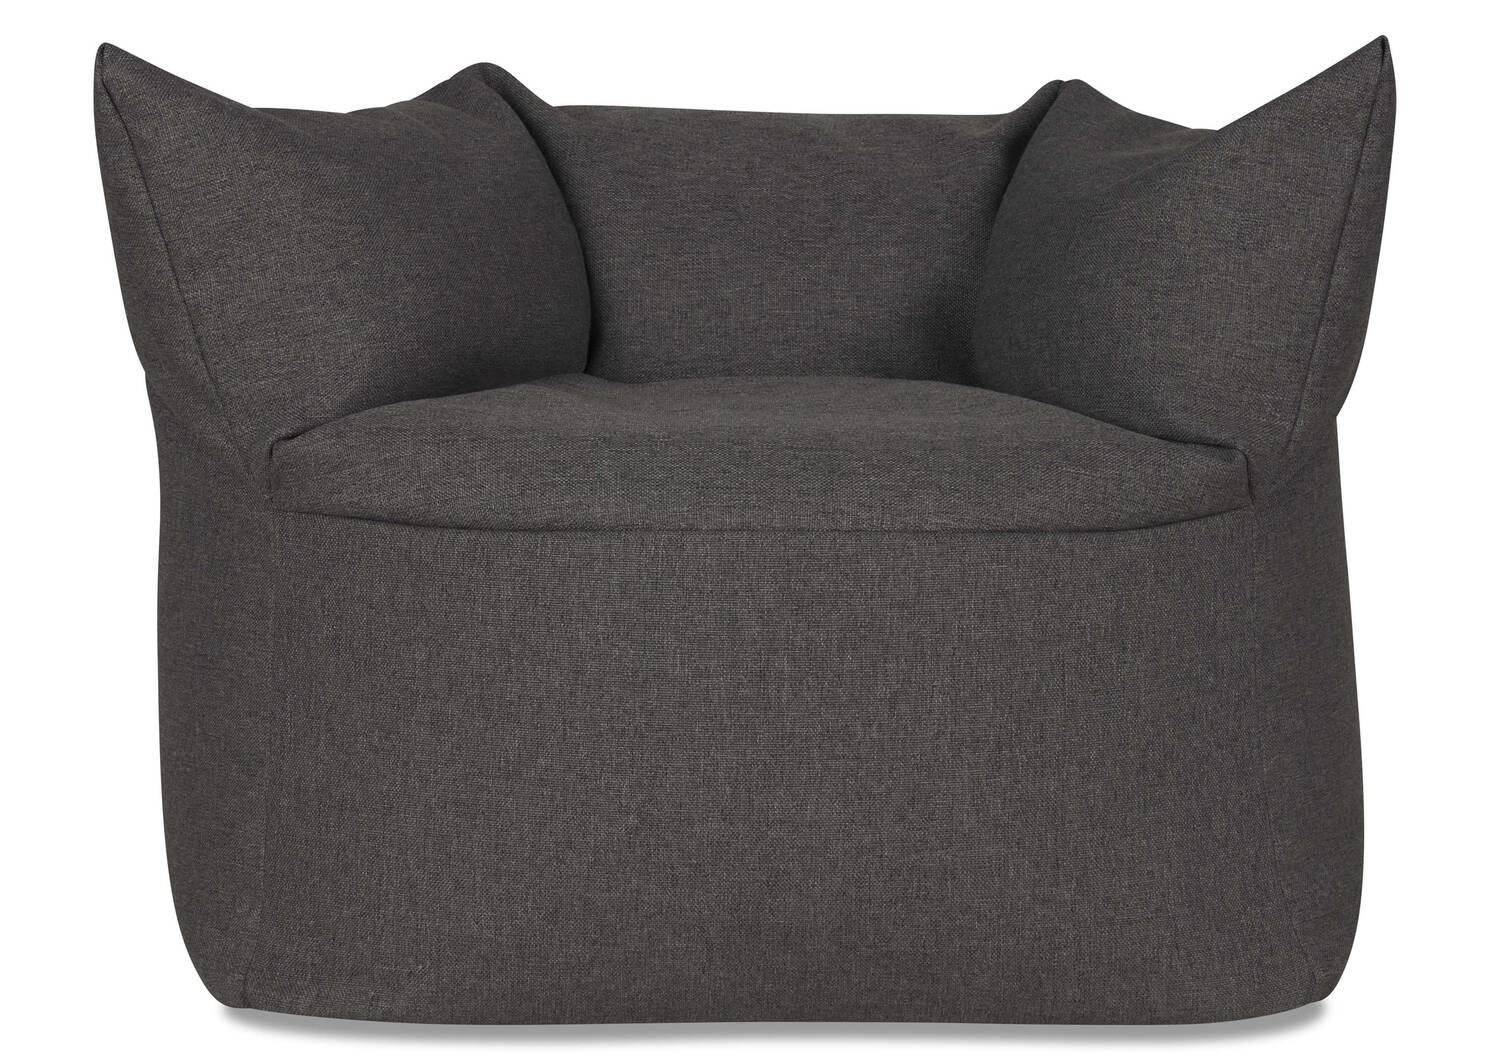 Torrance Chair -Kobe Graphite